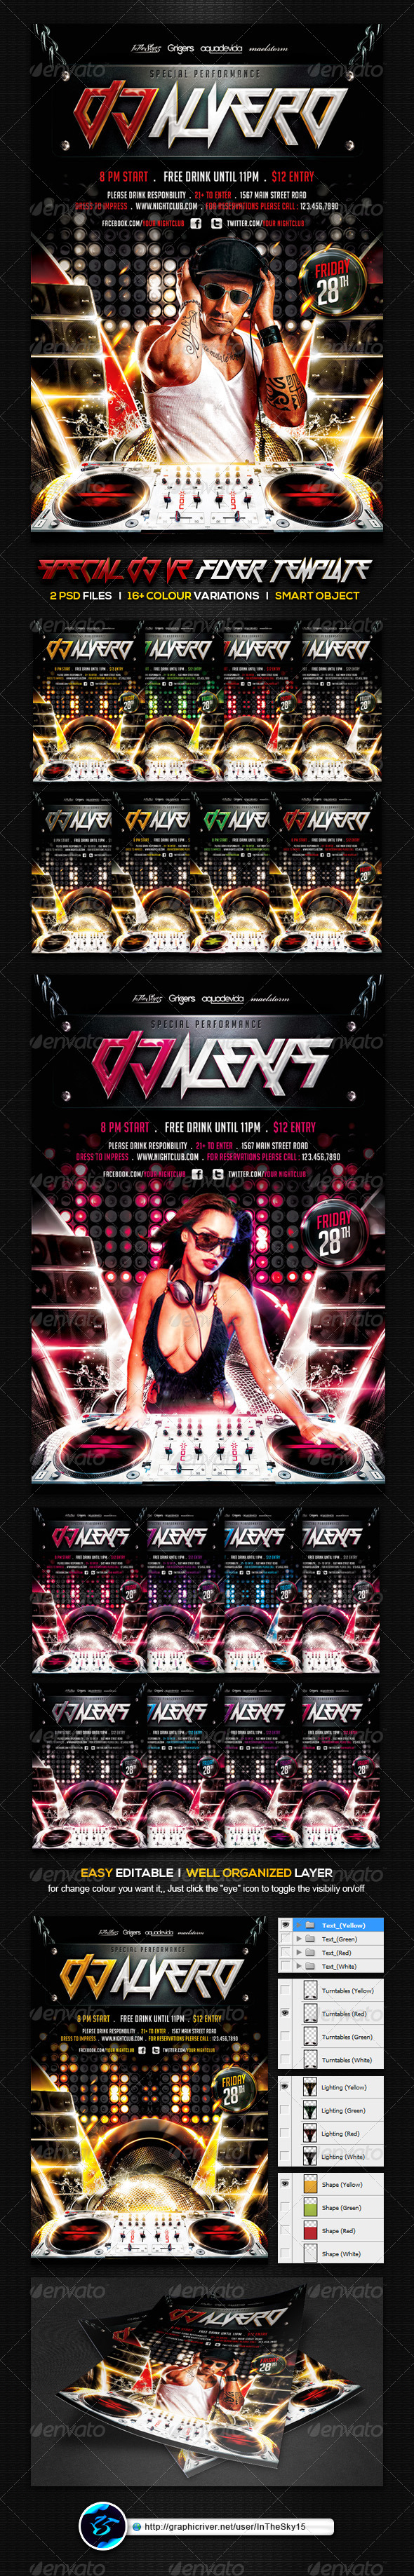 Special DJ V2 Flyer Template